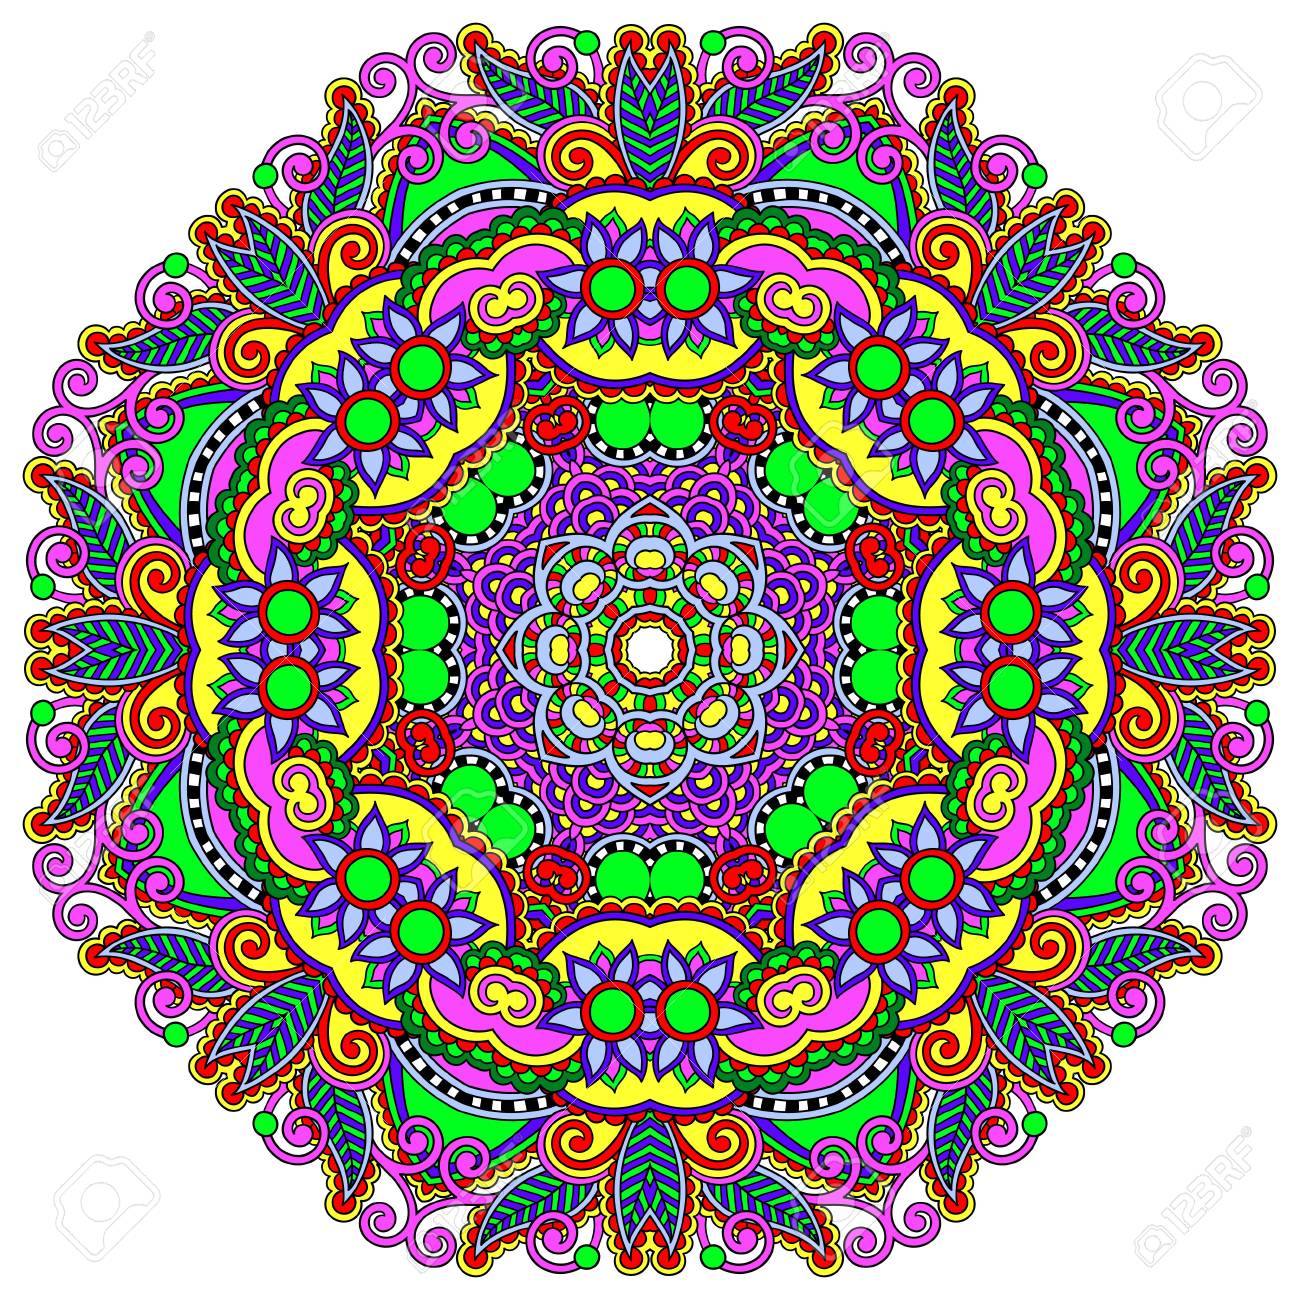 Circle lace ornament, round ornamental geometric doily pattern Stock Vector - 21680436